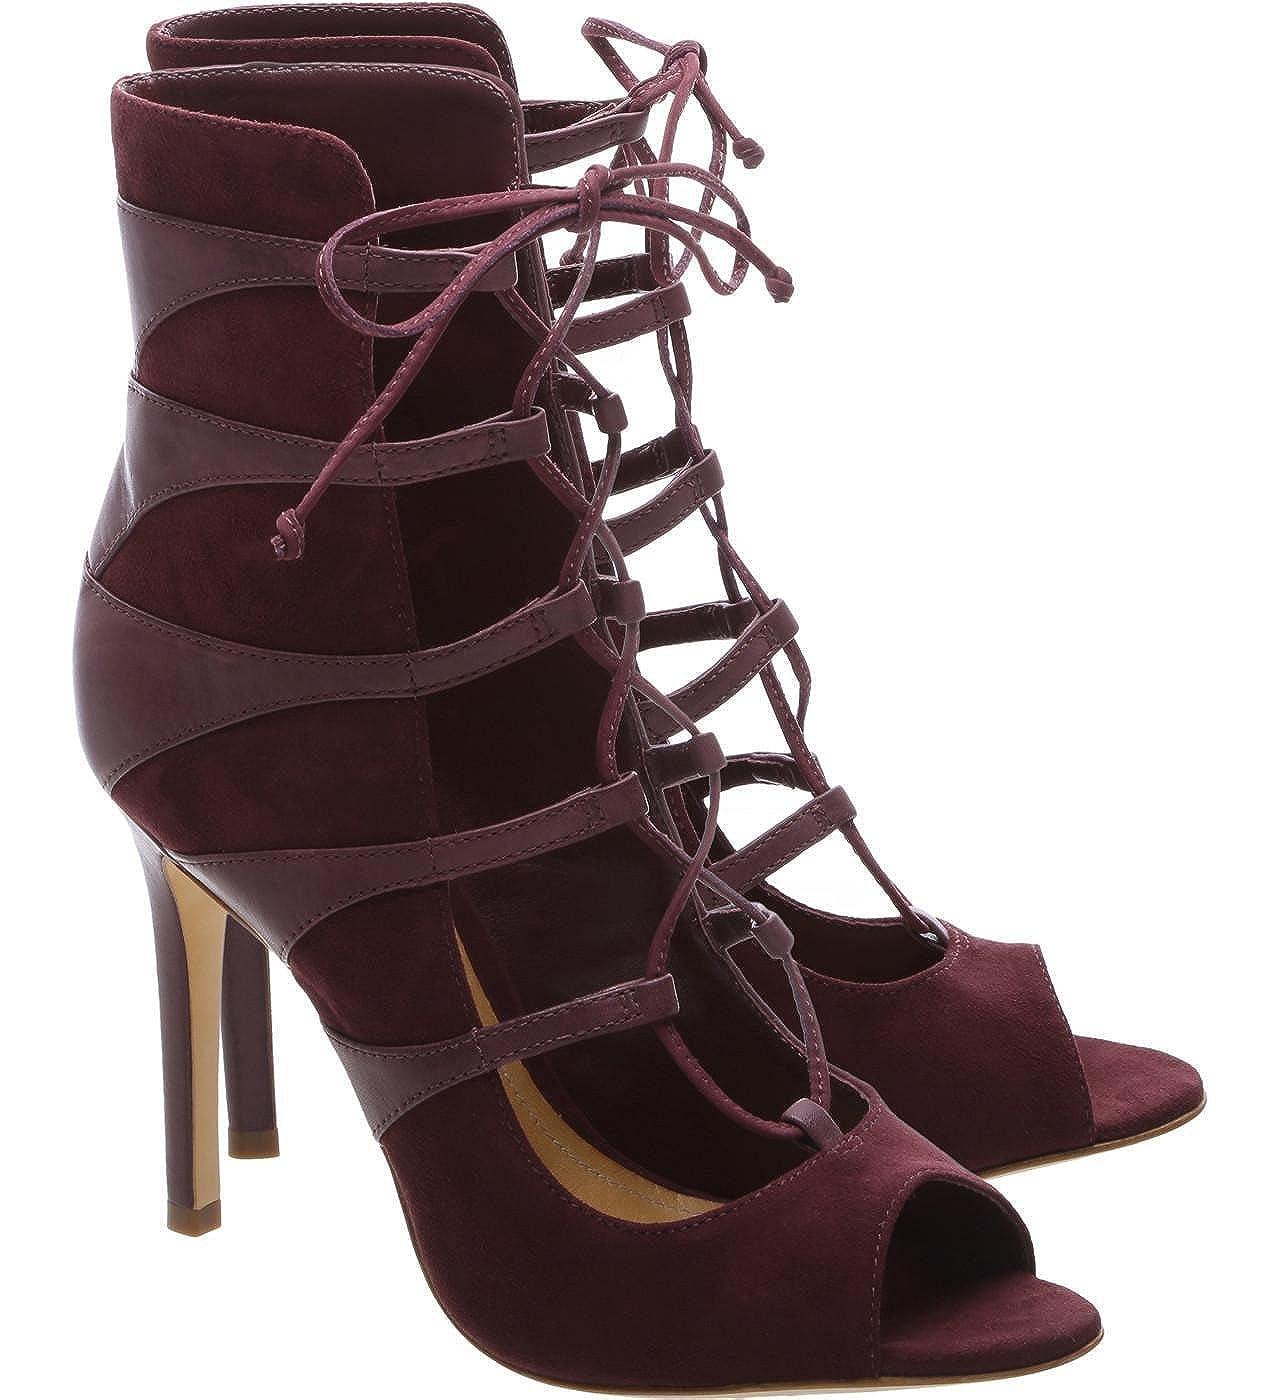 0890993ef6c Amazon.com: SCHUTZ Women's Kardita Cabernet Burgundy Suede Lace up ...